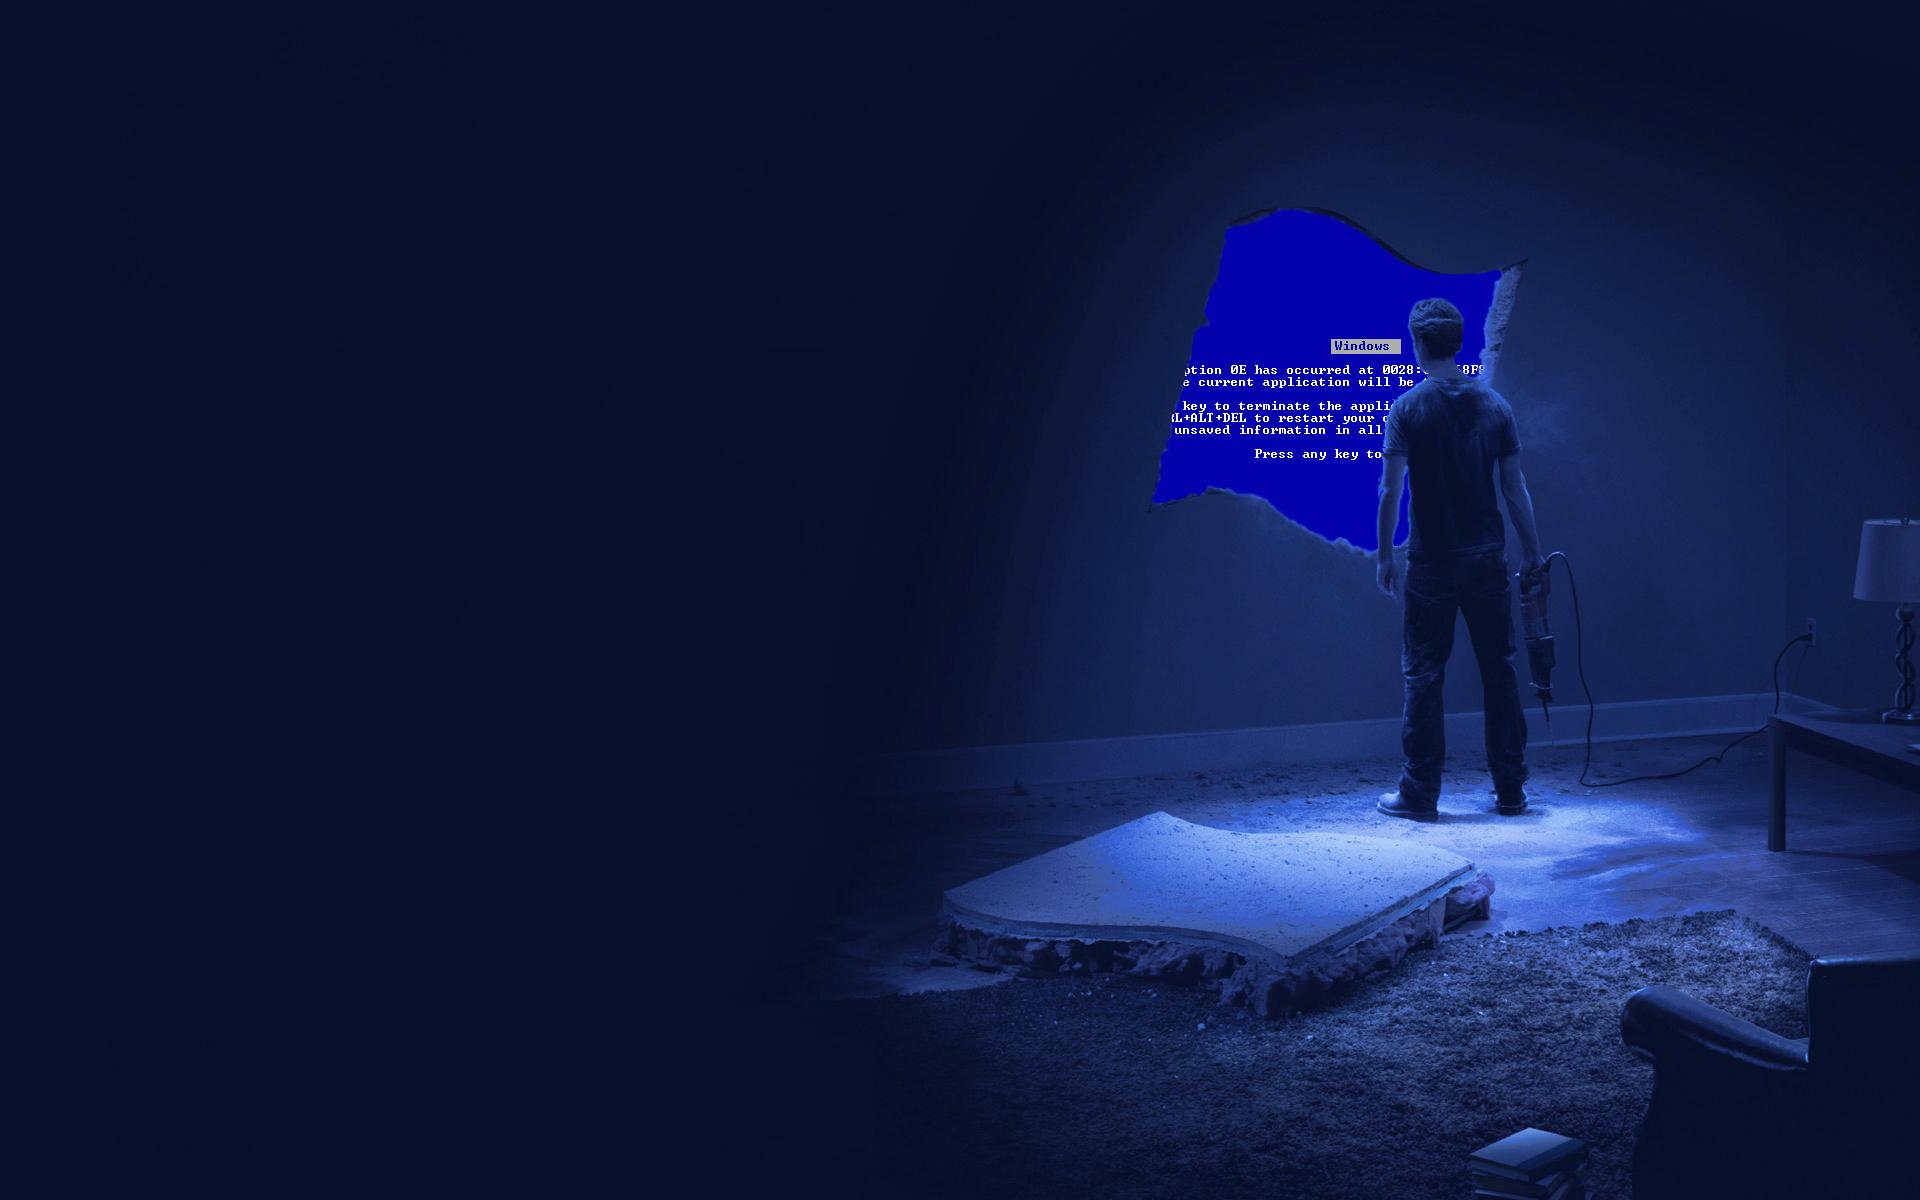 Blue Screen Of Death Free Wallpaper Wallpaperjamcom